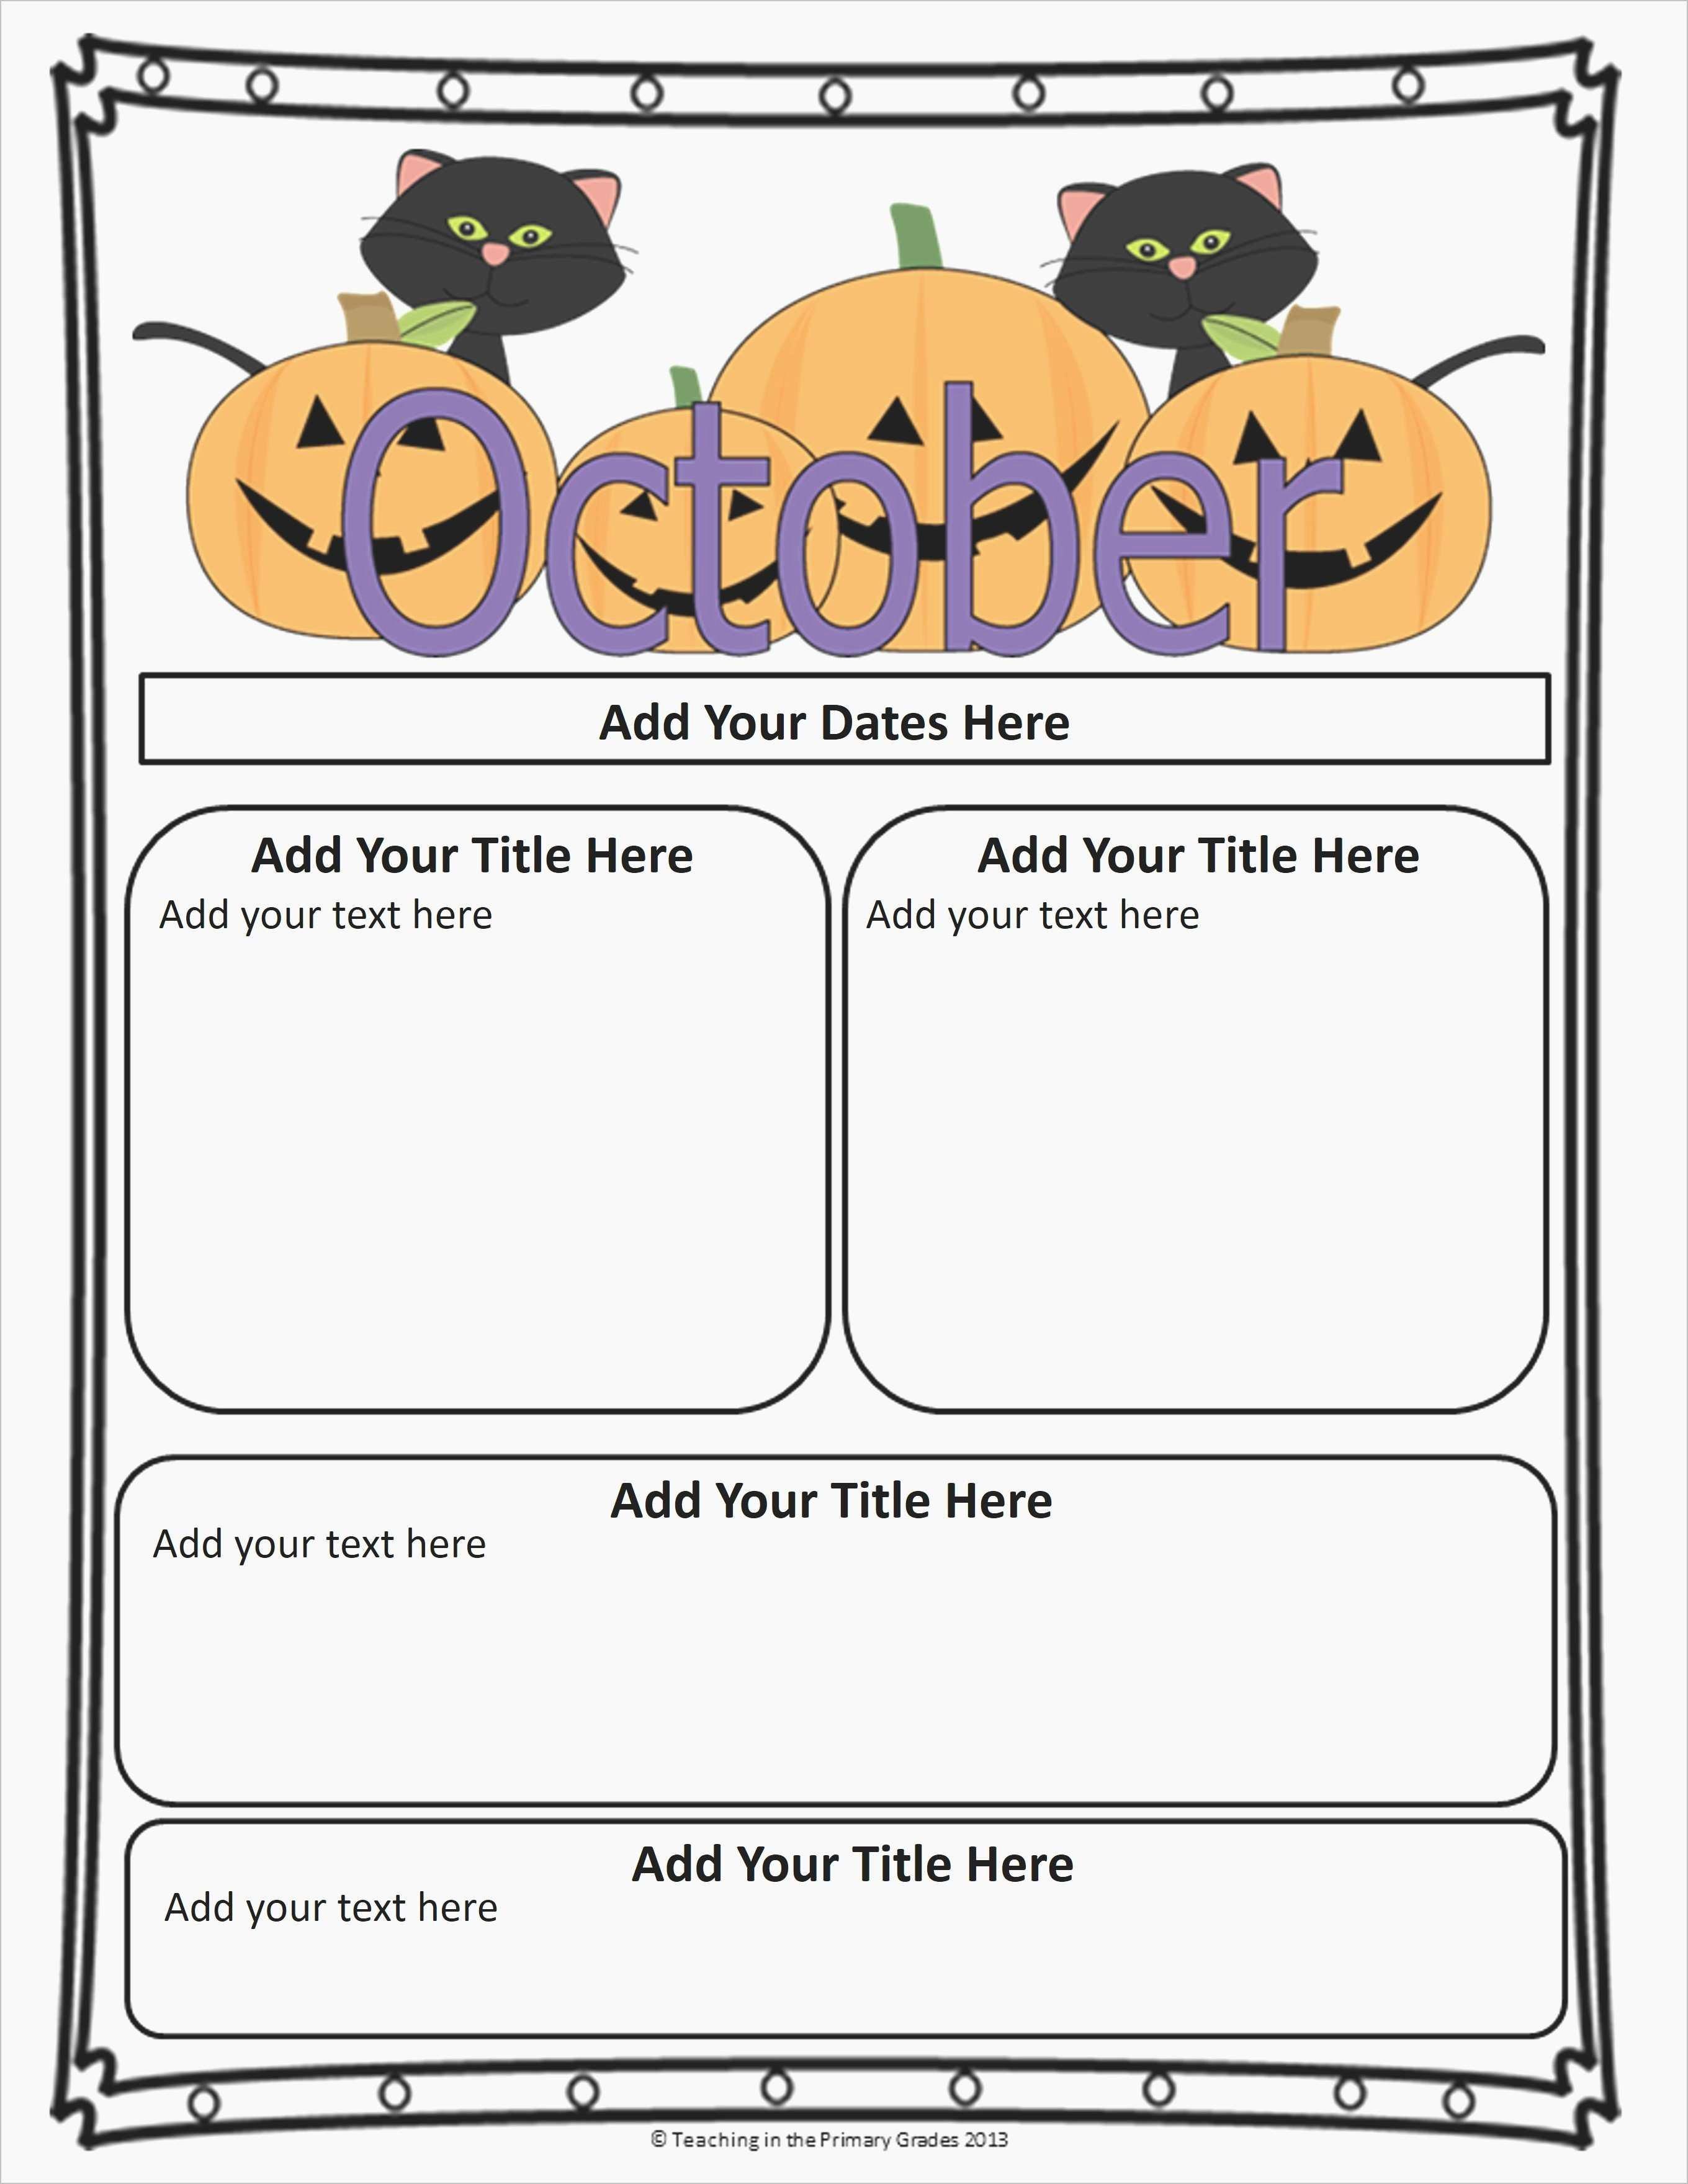 Monthly Newsletter Template for Teachers Inspirational Fresh Free Editable Monthly Newsletter Templates for